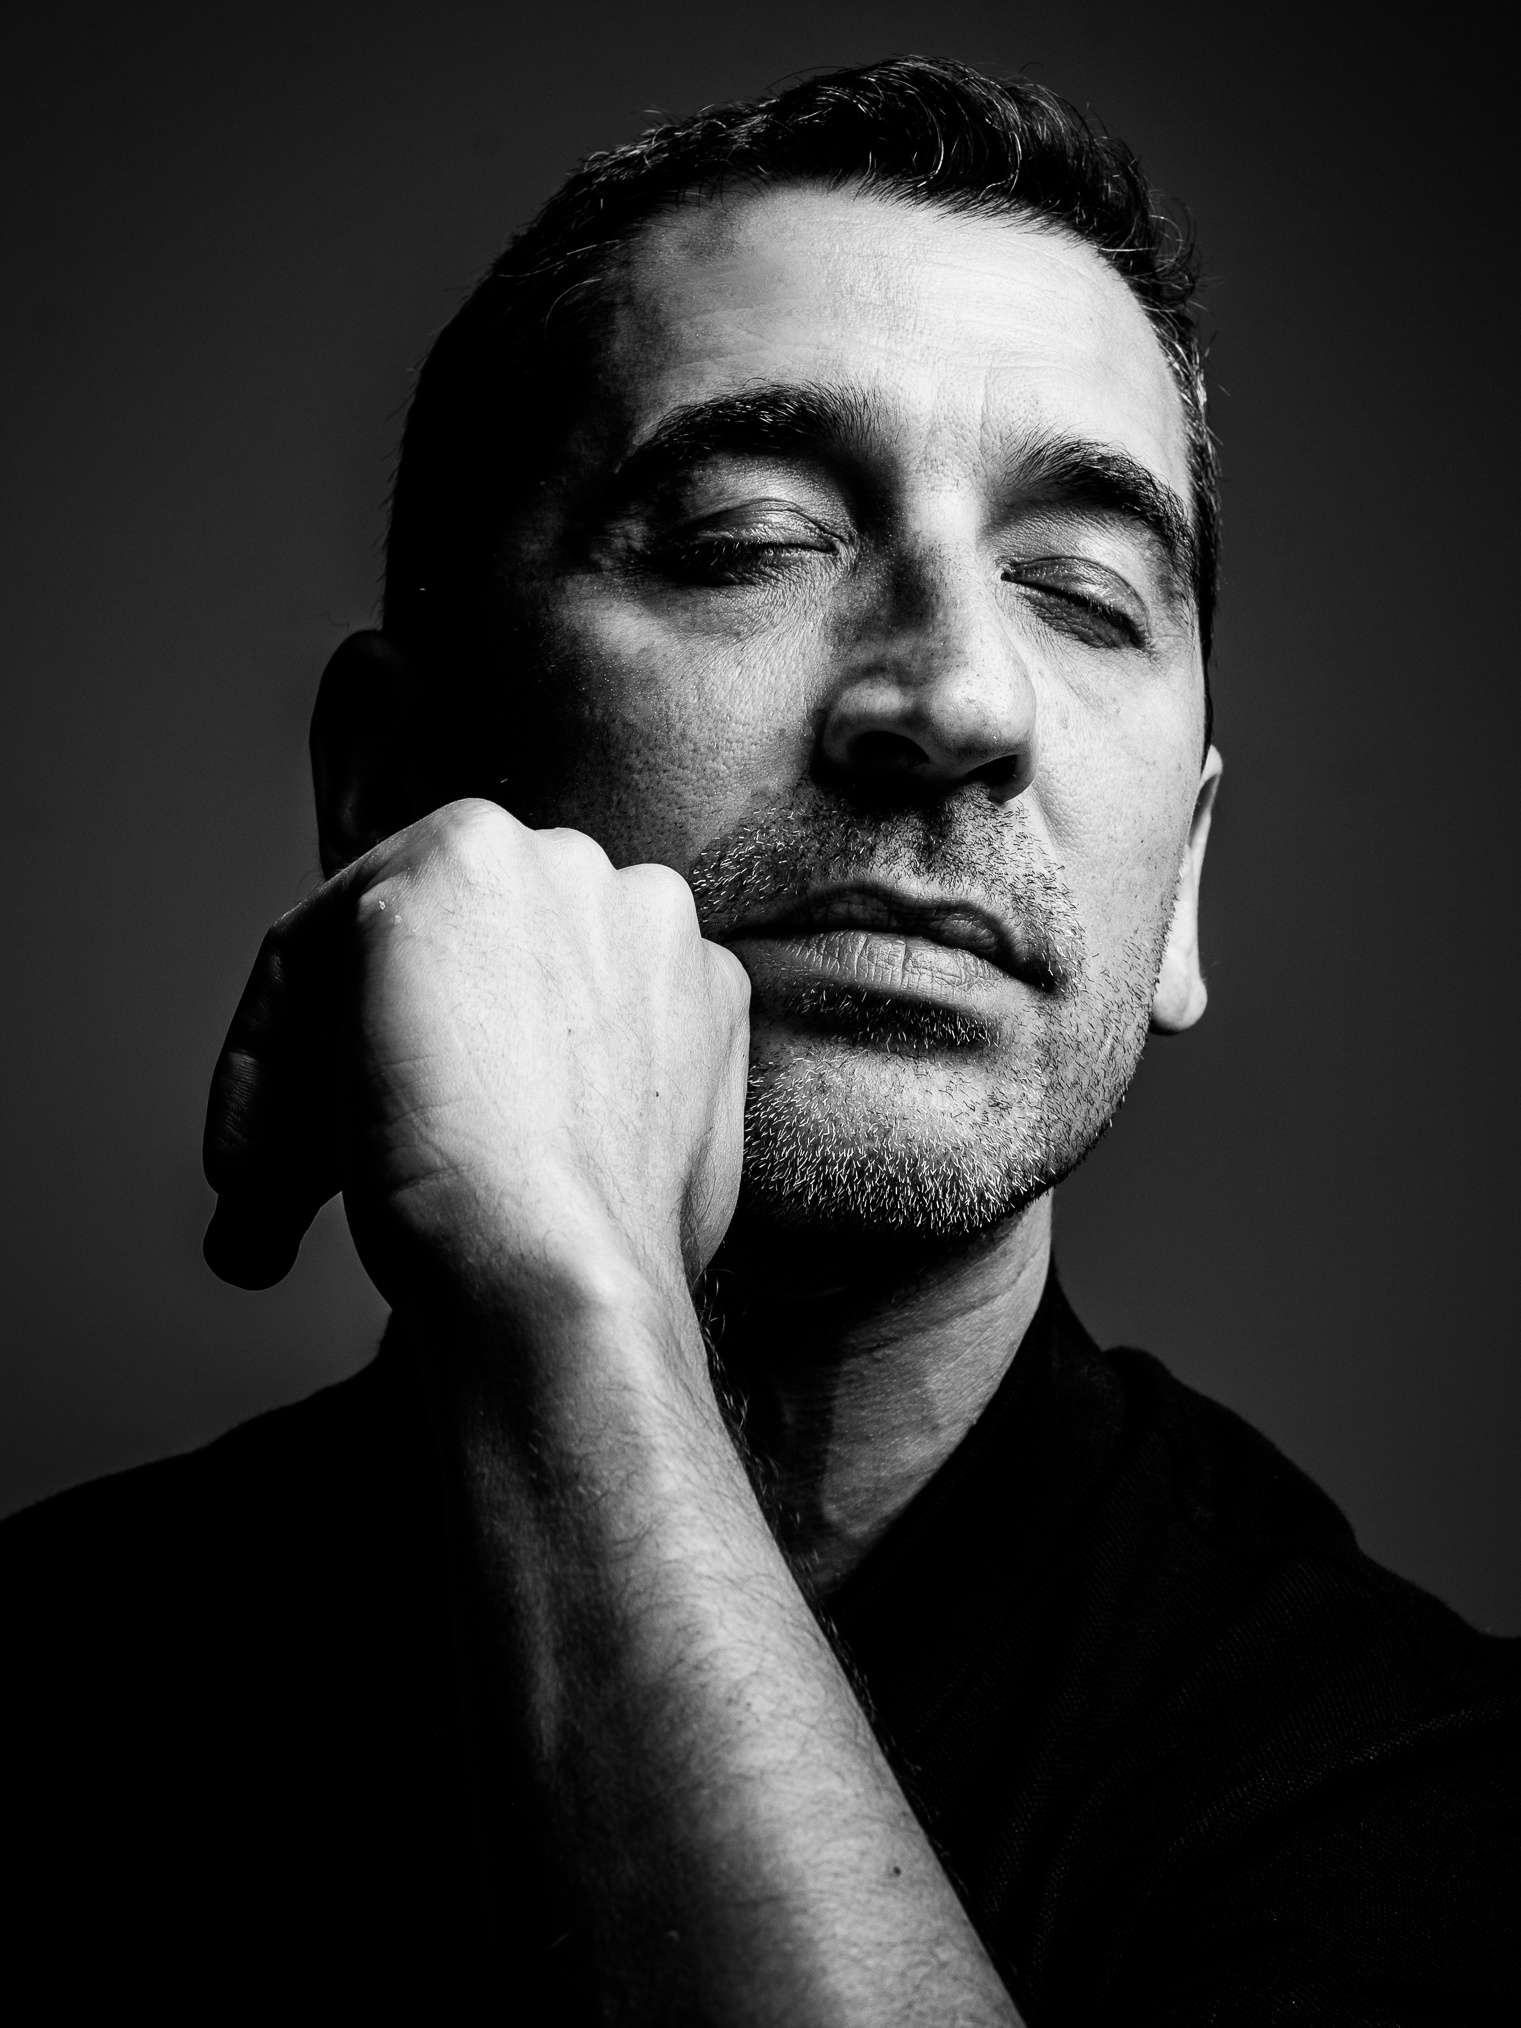 Ángel Sanzo - PORTRAIT - GABY MERZ, circus photography